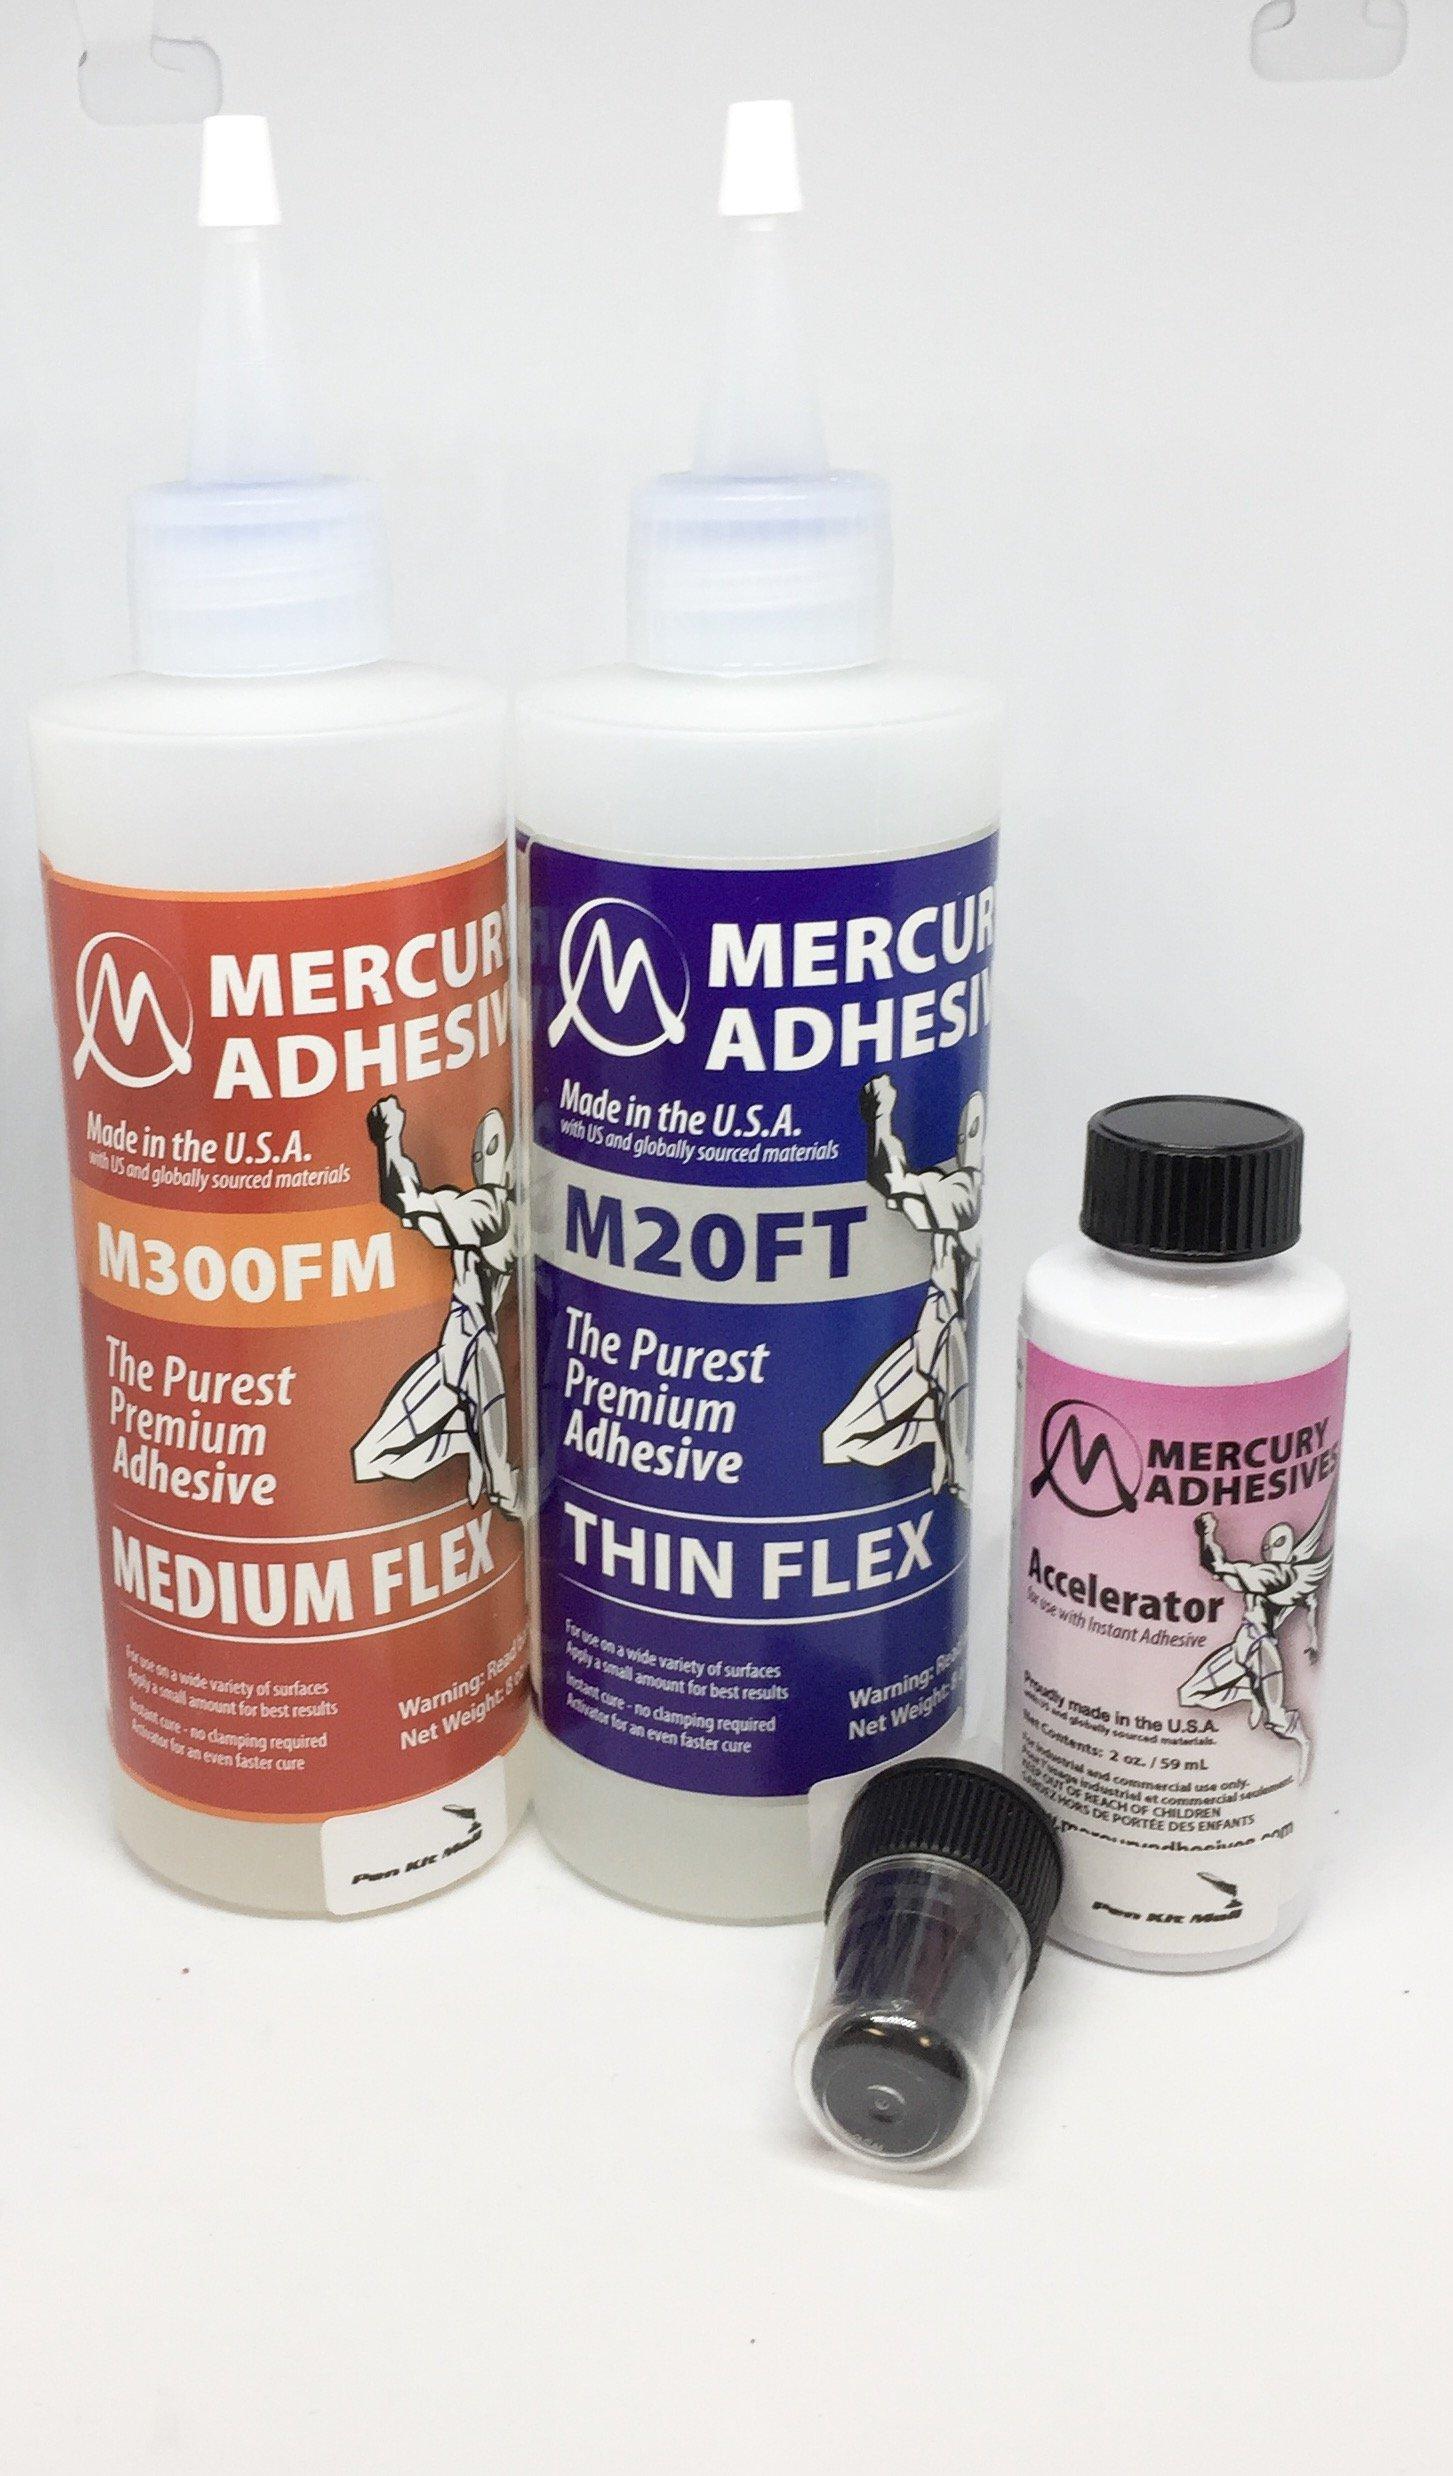 PKM Mercury Adhesives Flex Combo PK 8 OZ Thin Flex 8 OZ MED Flex & 2 OZ ACTIVATOR/Accelerator